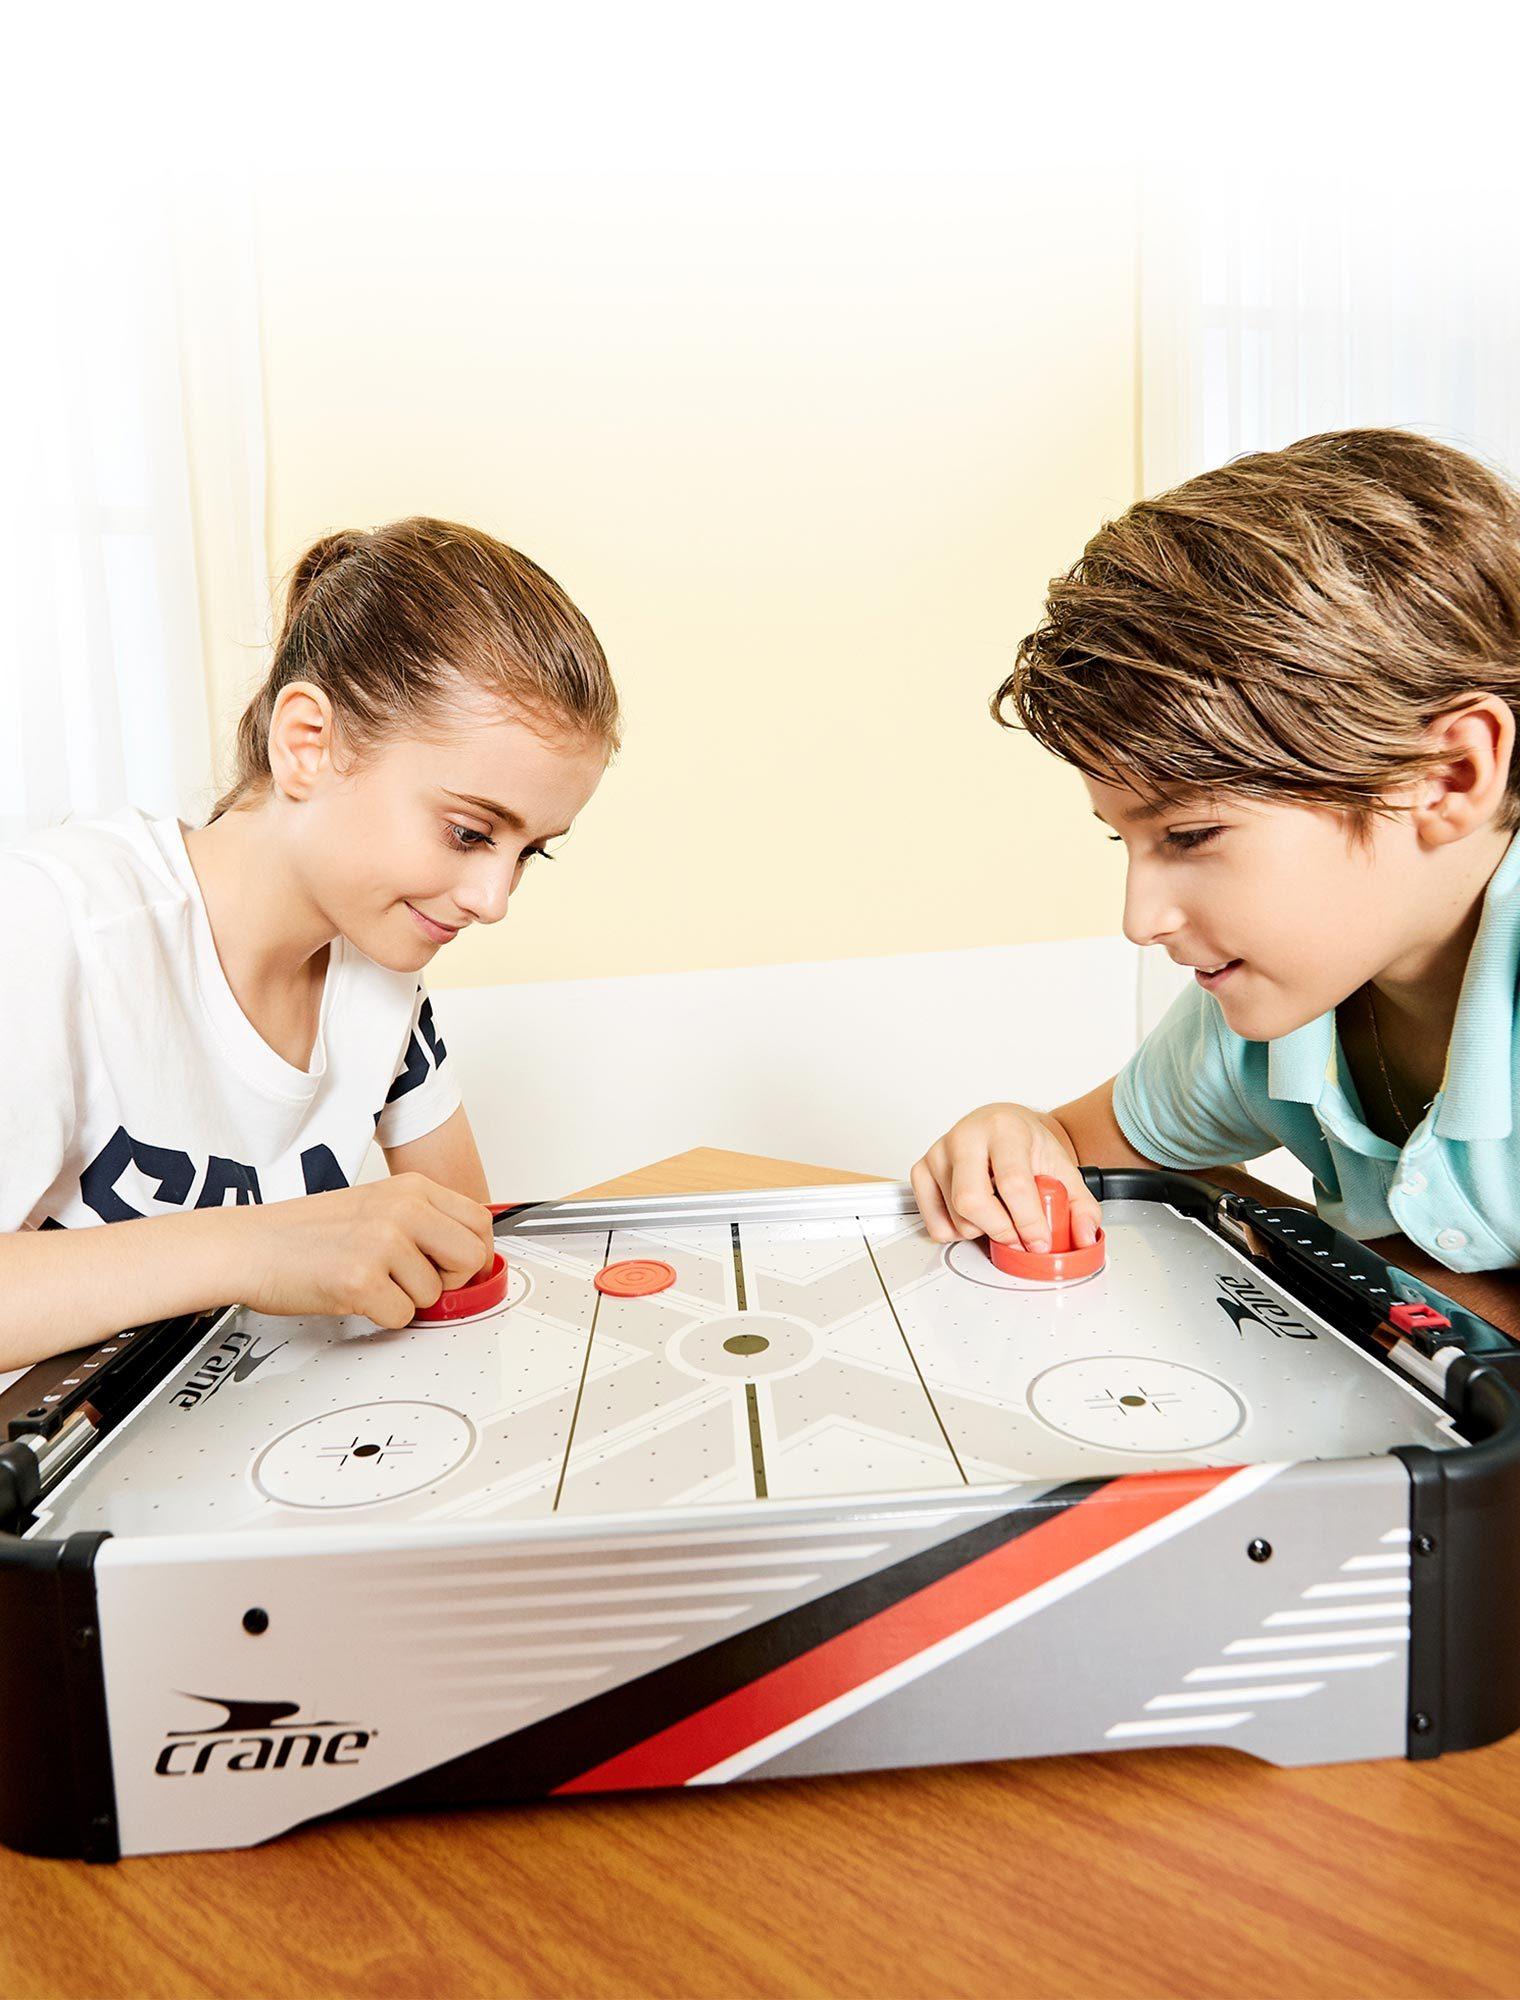 Crane Table Top Games